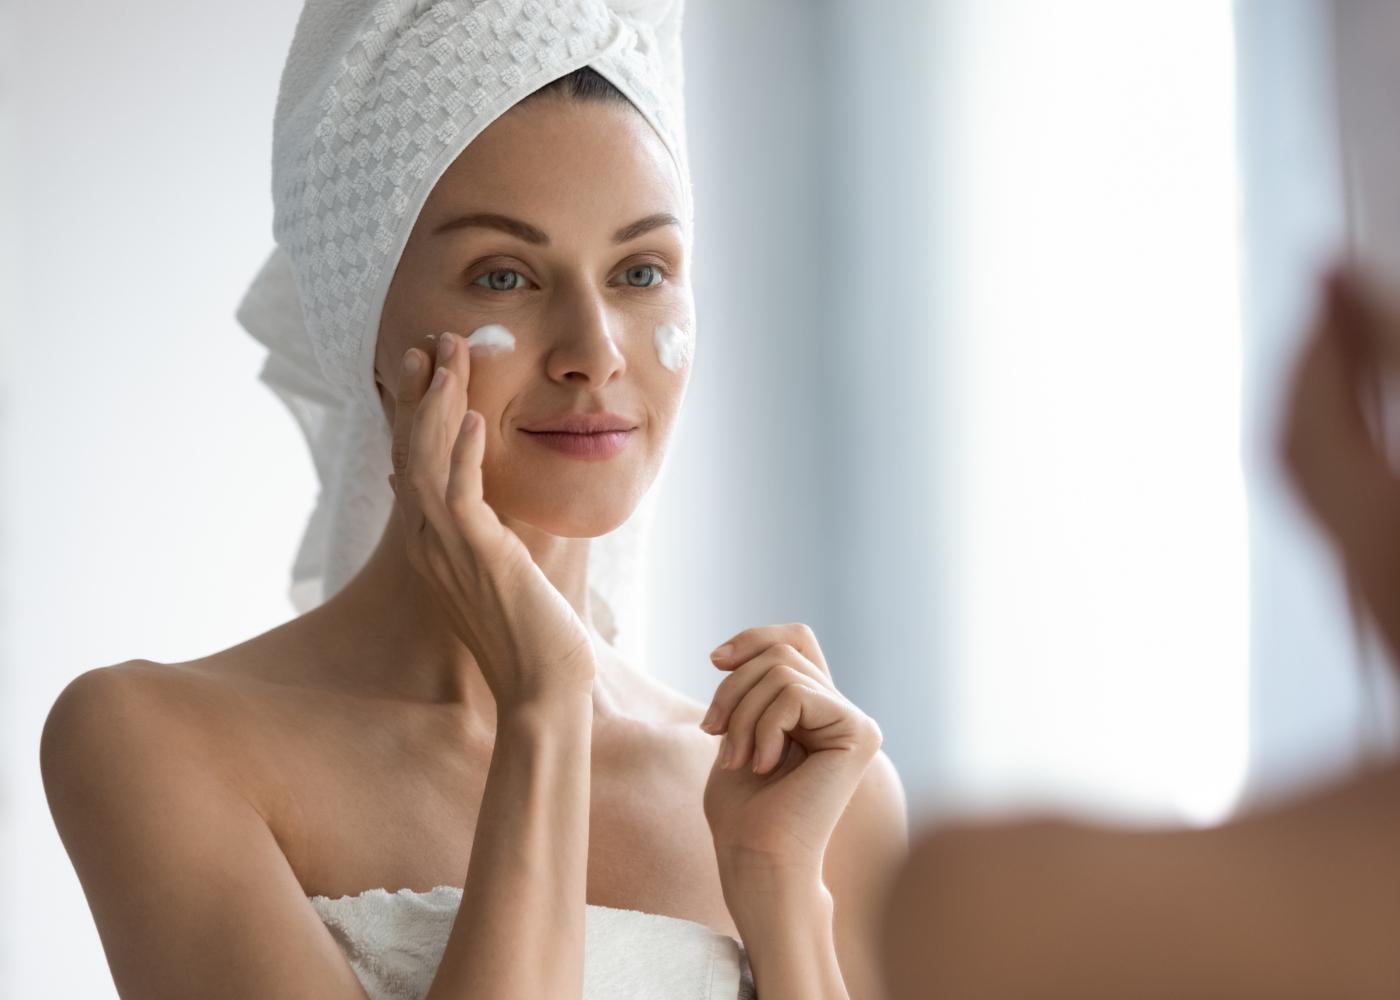 Mulher a aplicar creme hidratante na cara